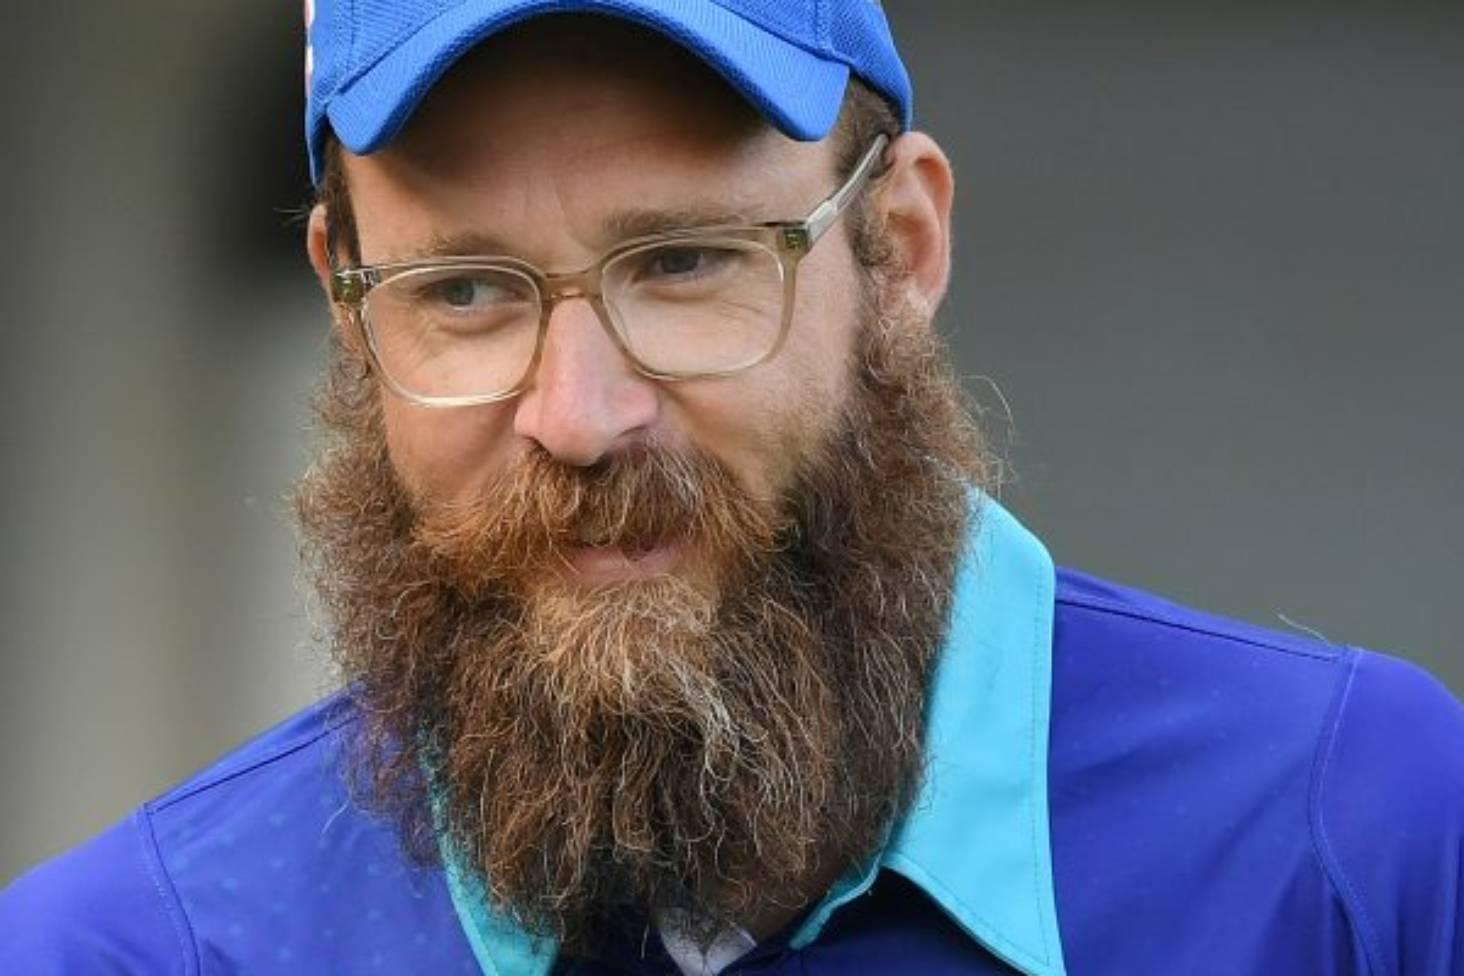 Black Clash: It's Dumbledan, the Daniel Vettori beard as you've never seen  it before | Stuff.co.nz